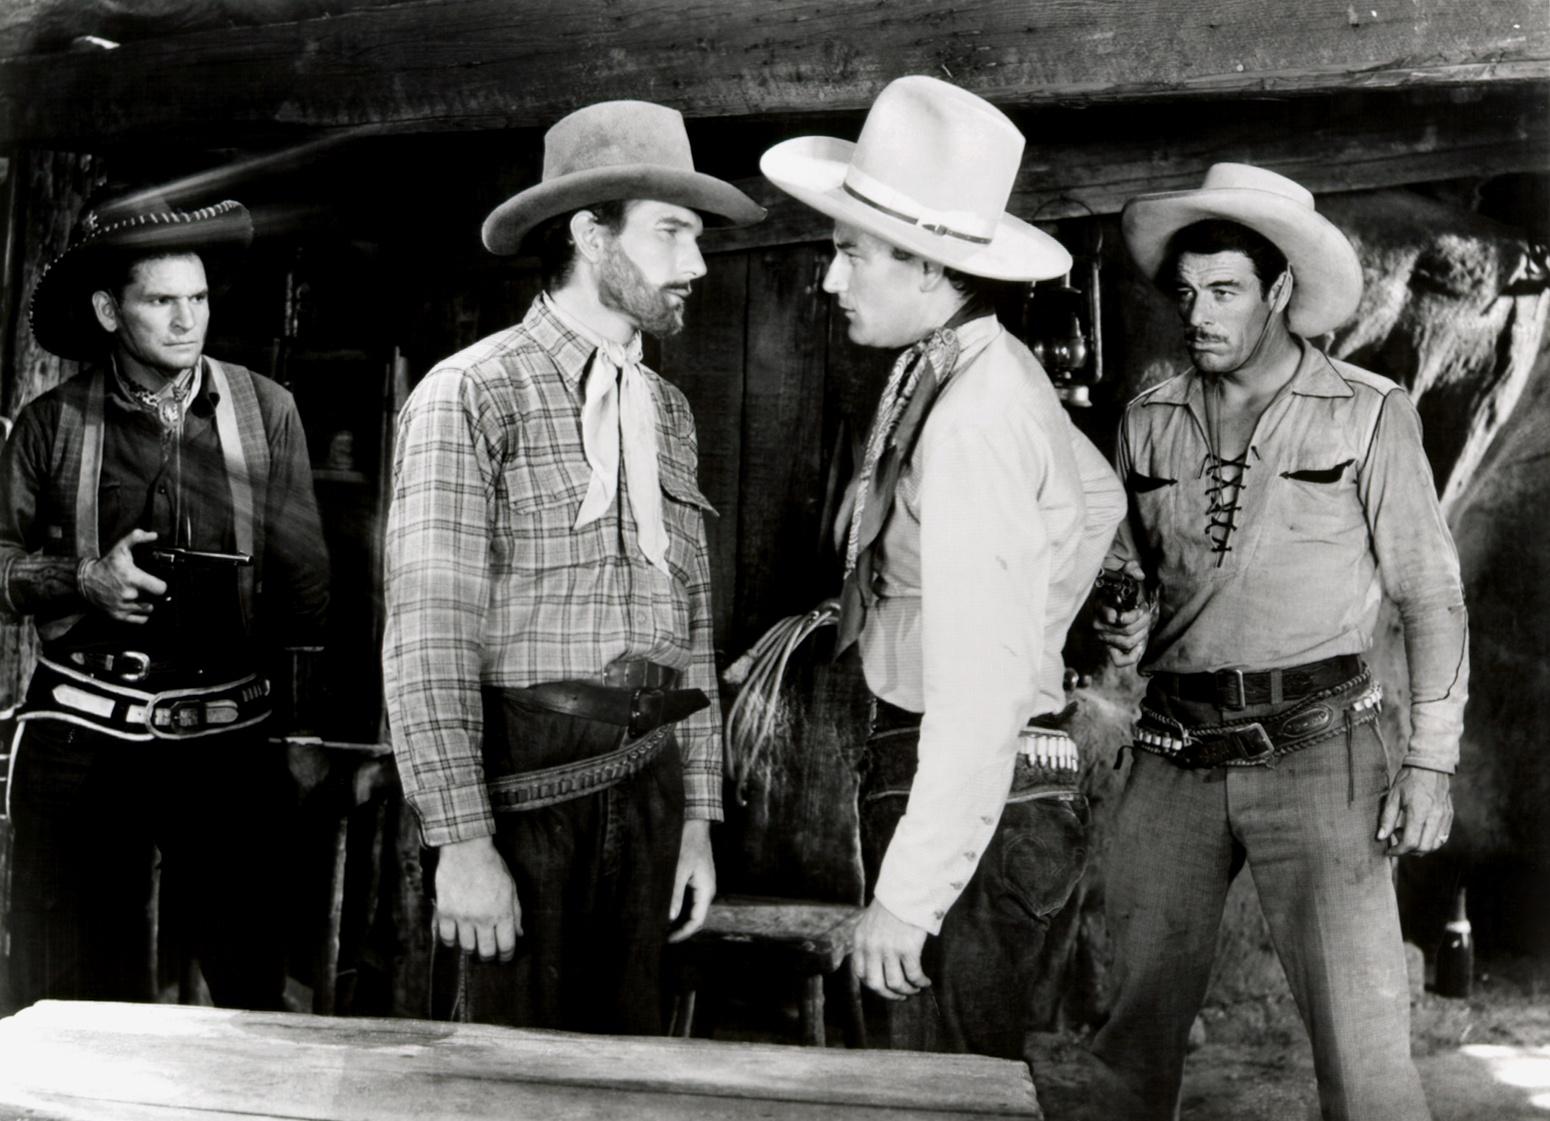 (L to R) Yakima Canutt, Unknown, John Wayne, Glenn Strange